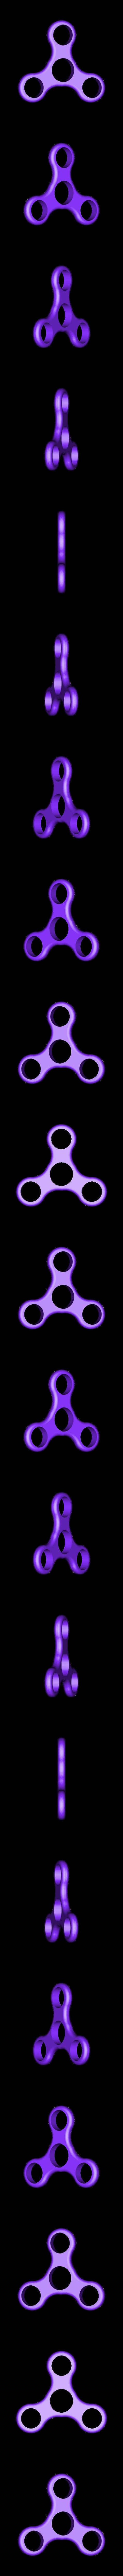 Penny_Spinner.stl Télécharger fichier STL gratuit Penny Spinner • Plan pour imprimante 3D, Desktop_Makes